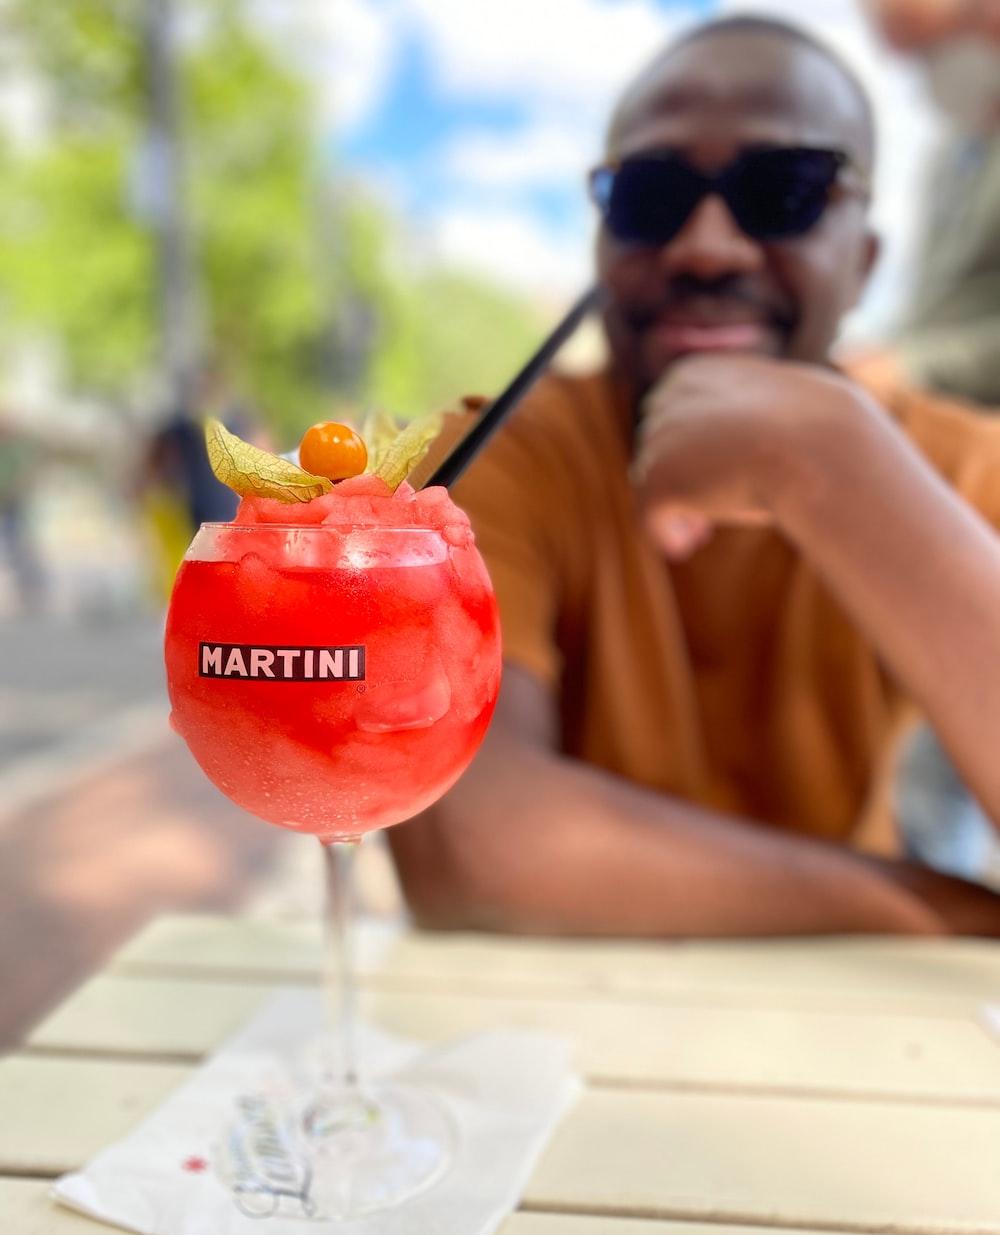 man in black sunglasses holding red fruit